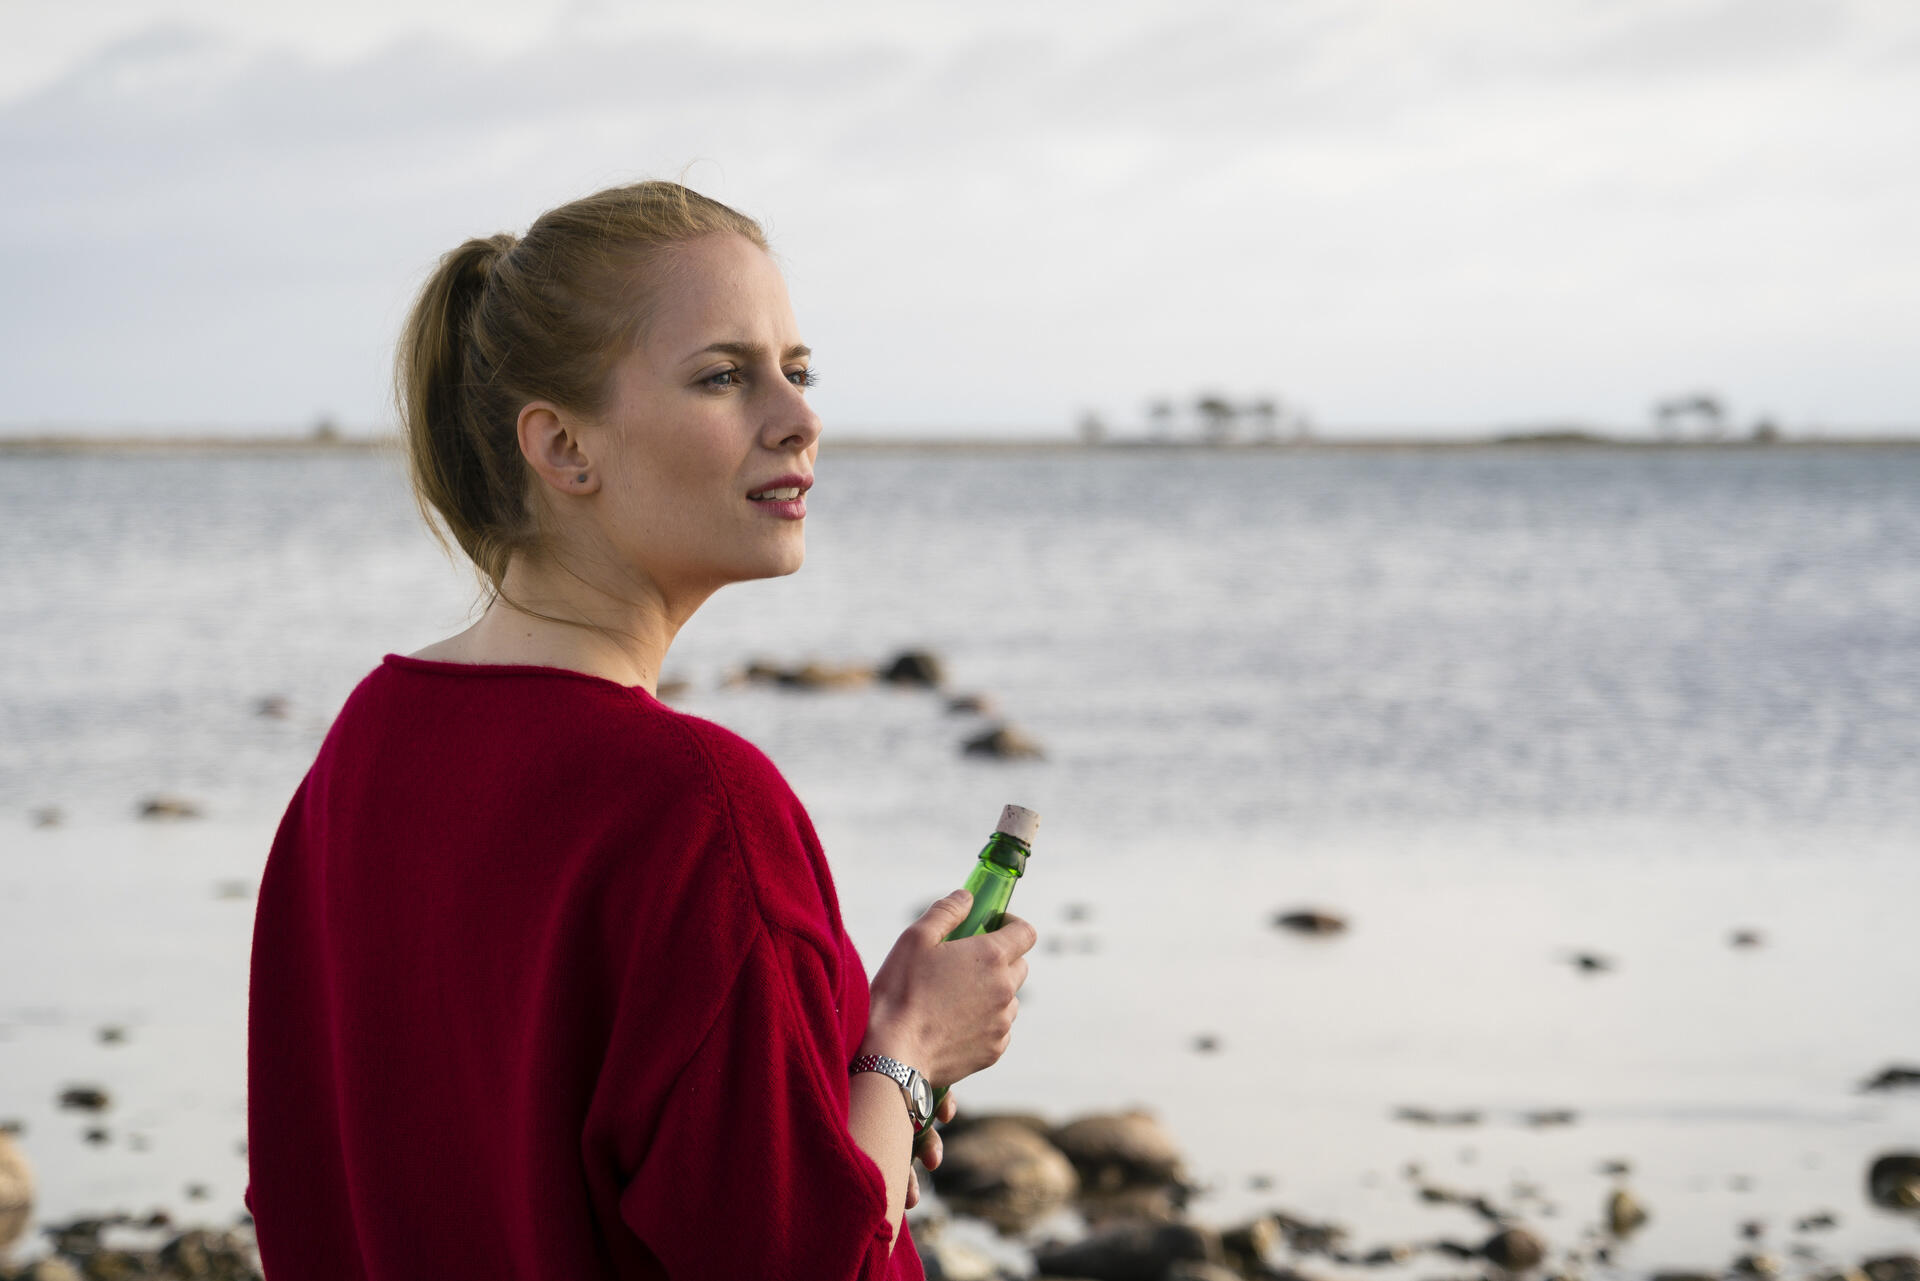 Inga Lindström: Liebe Lebt Weiter